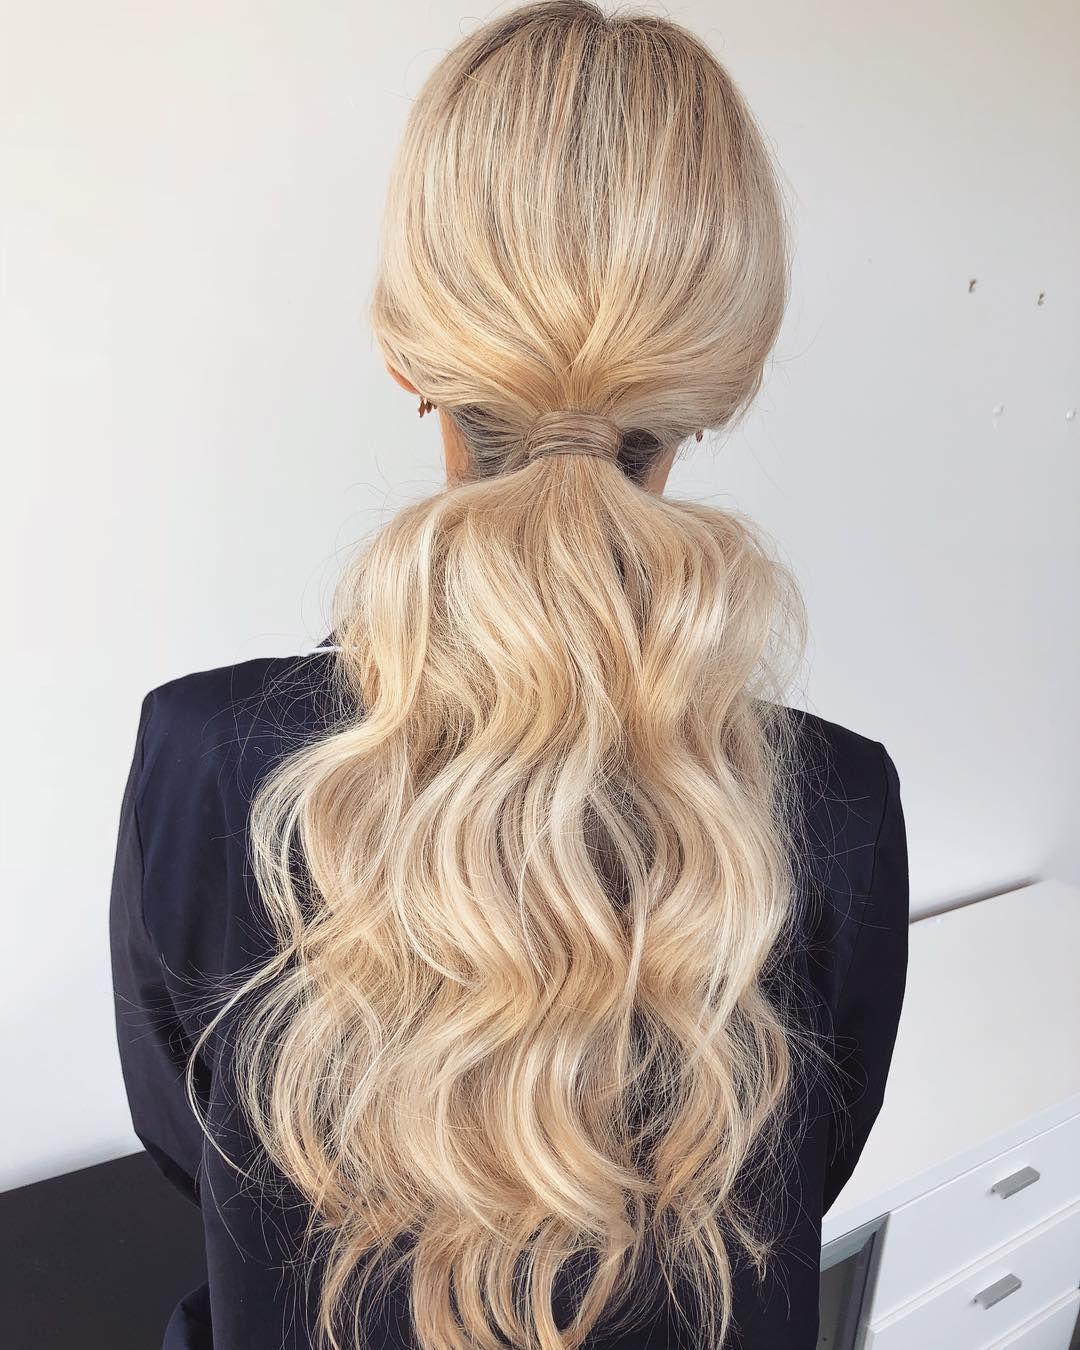 Textured ponytail bridal hairstyle, ponytail hairstyles  #weddinghair #ponytails #wedding #hairstyles #ponytail #weddinghairstyles